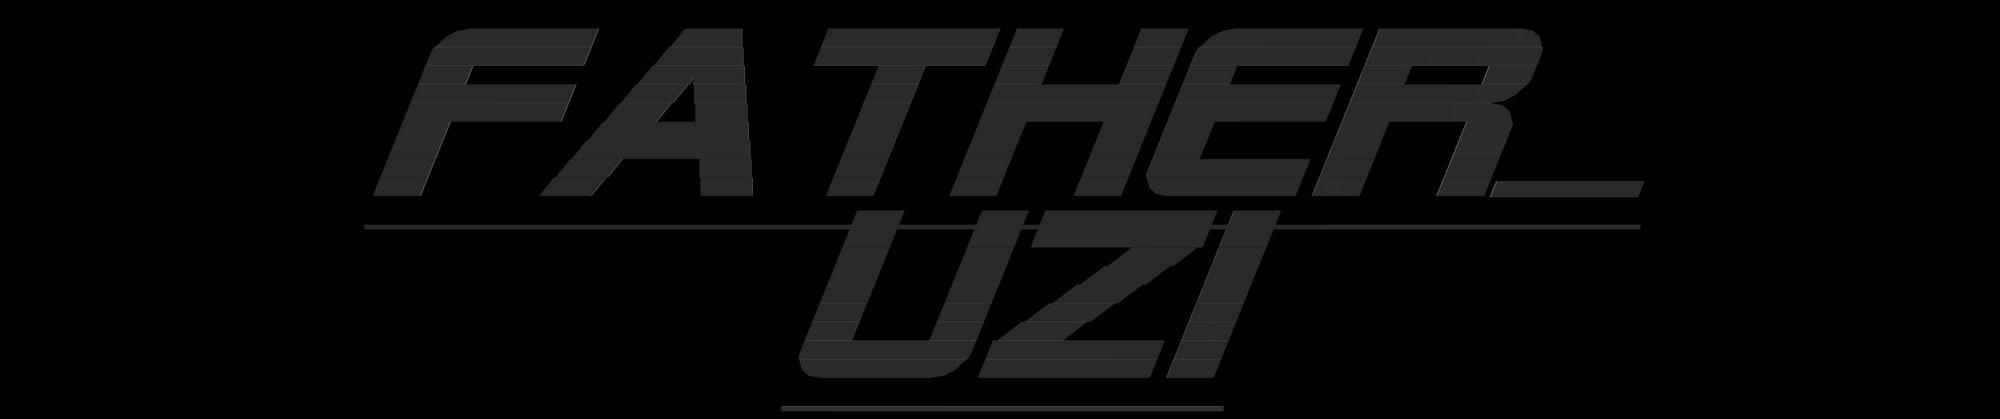 Discover Father Uzi